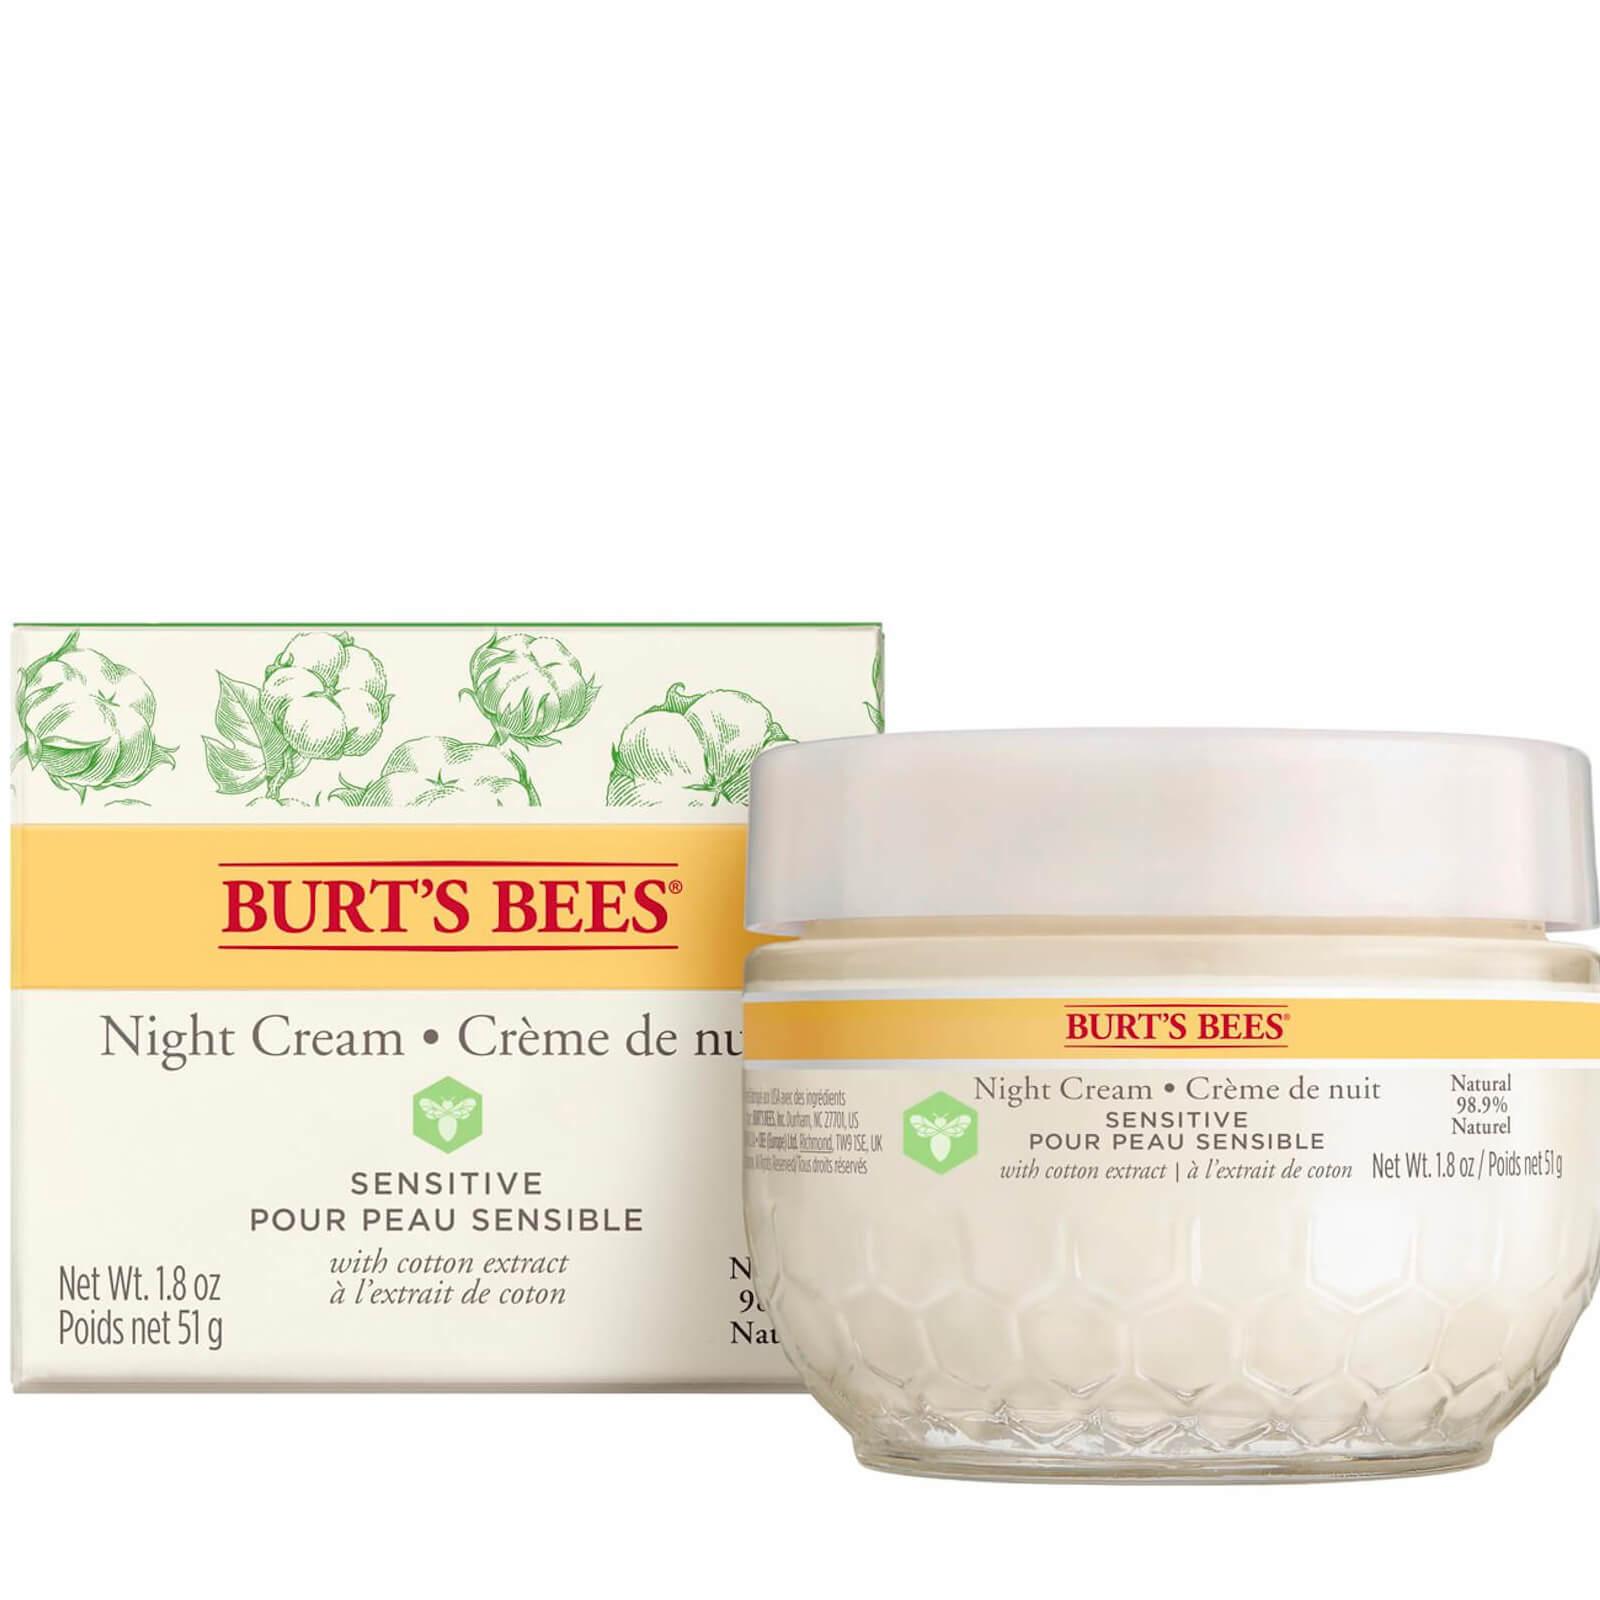 Sensitive Skin Night Cream 50g